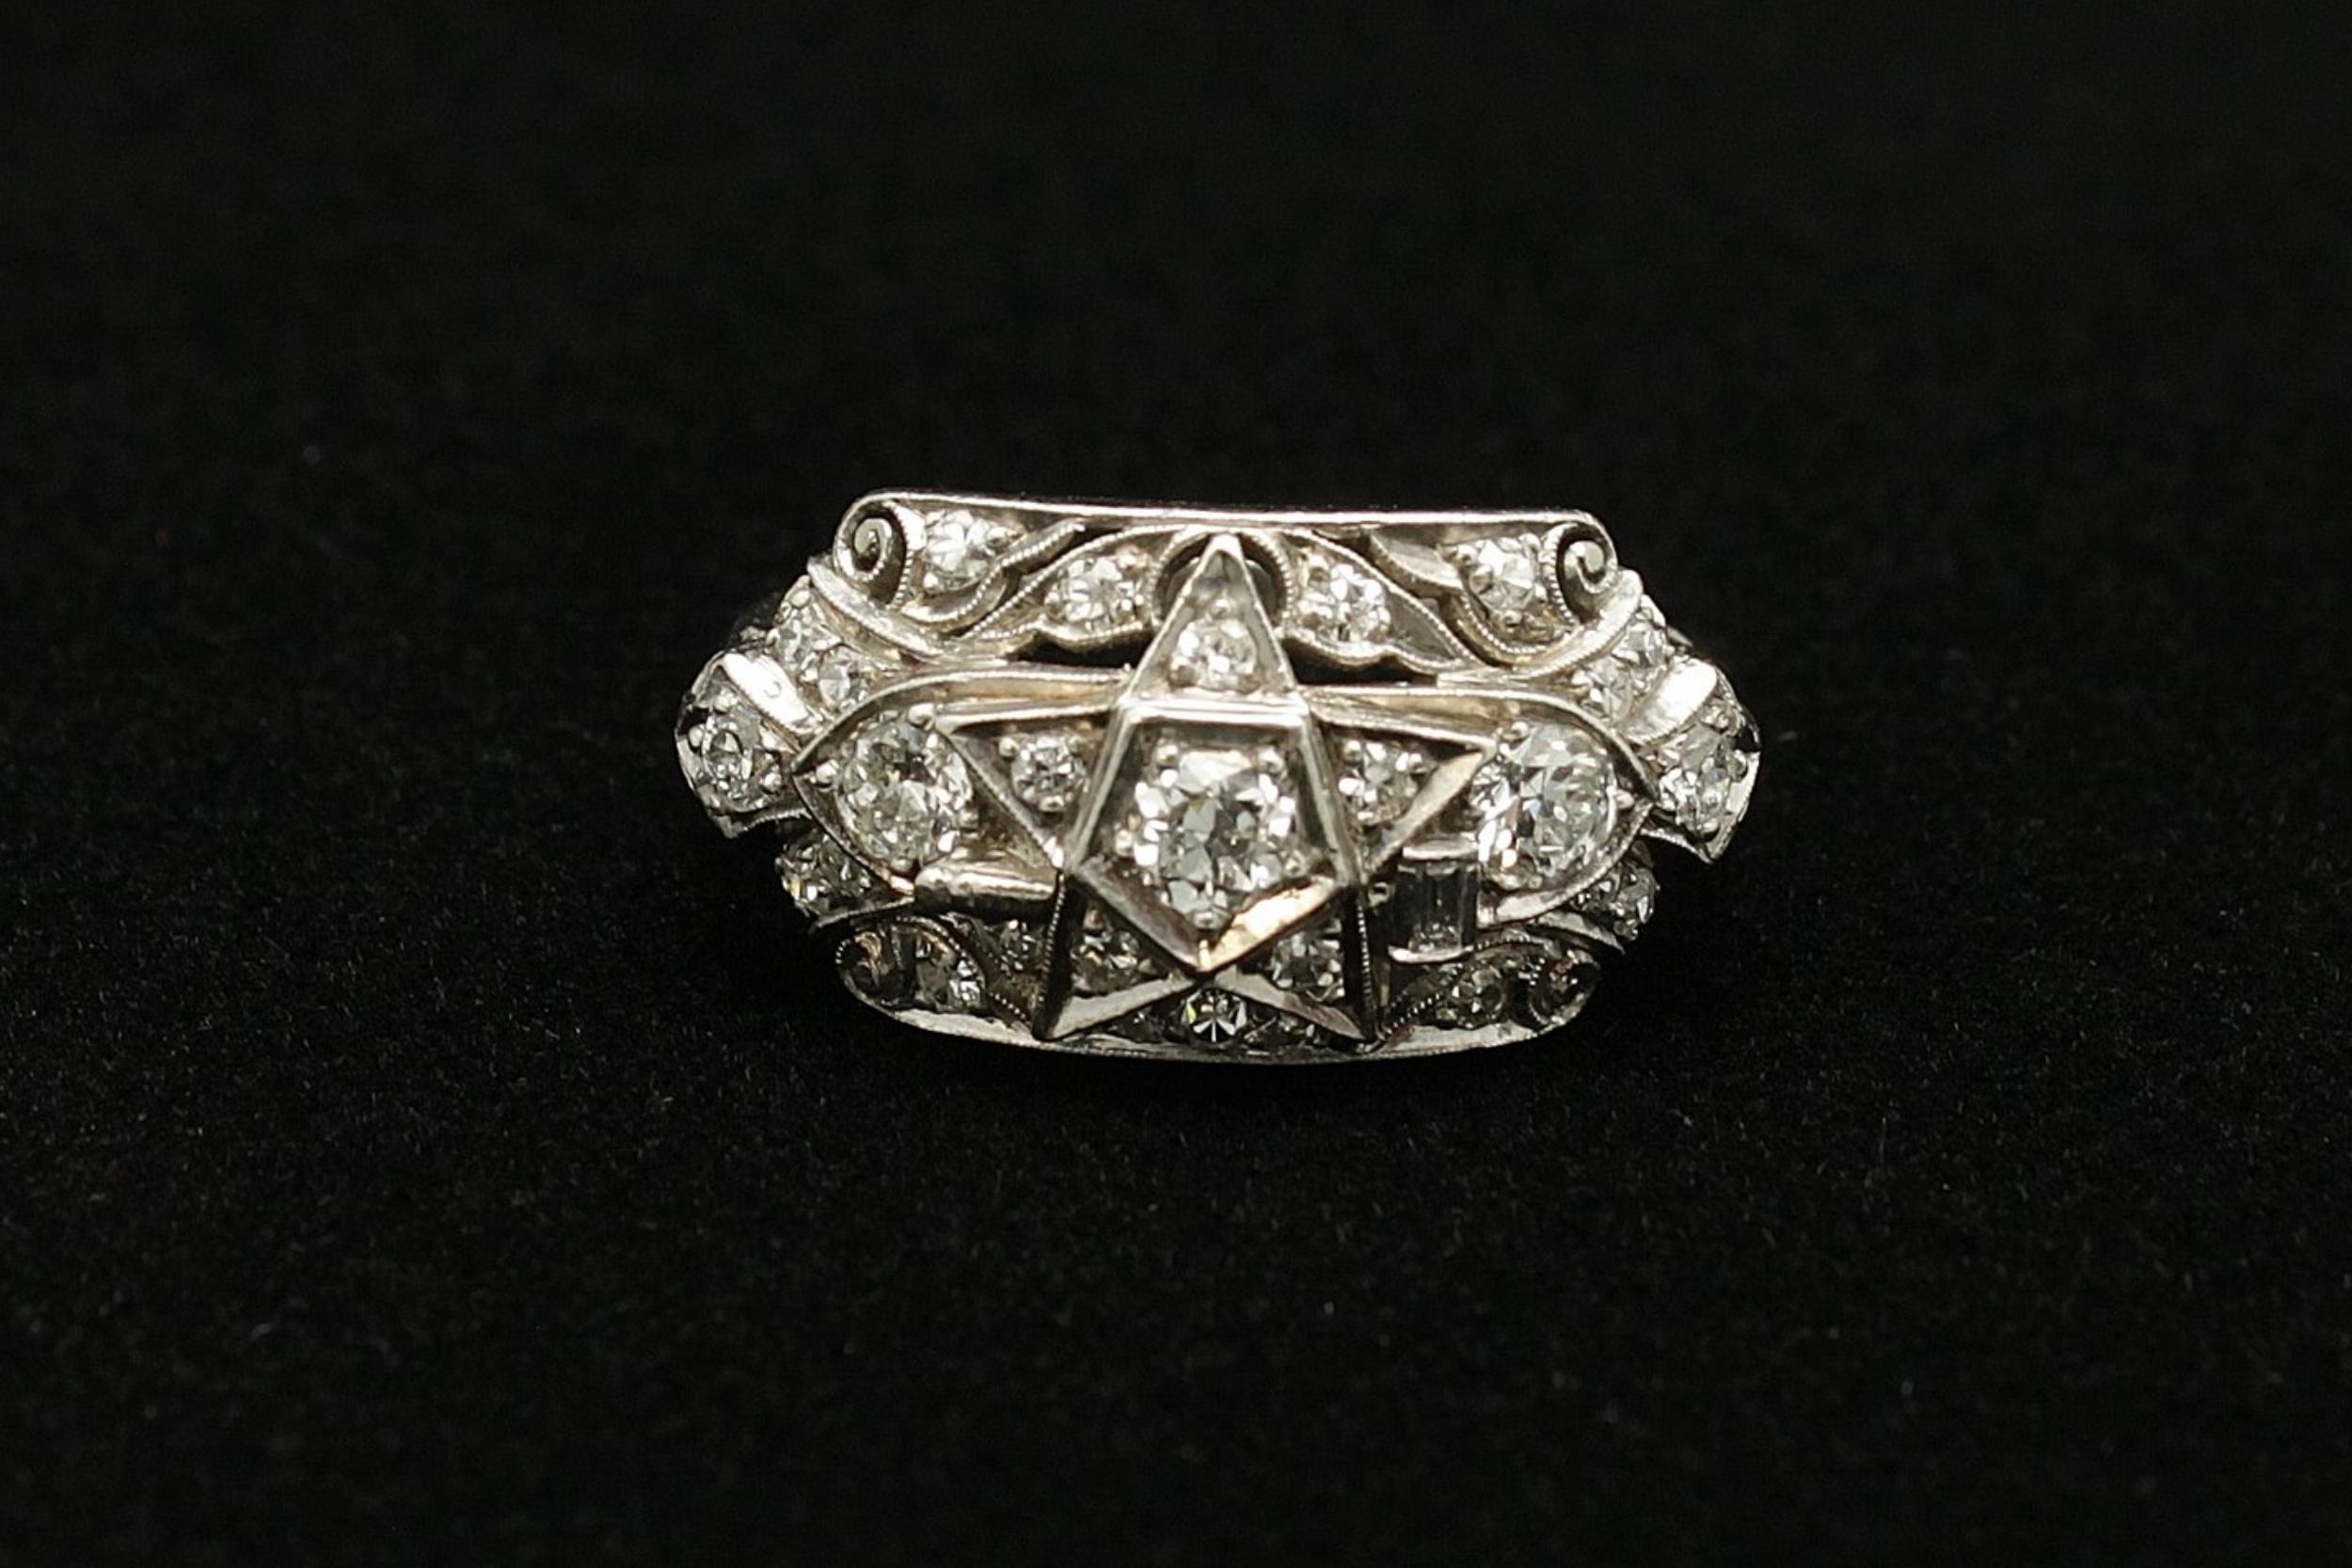 Antique Platinum Diamond Old Mine Cut 1.65cts